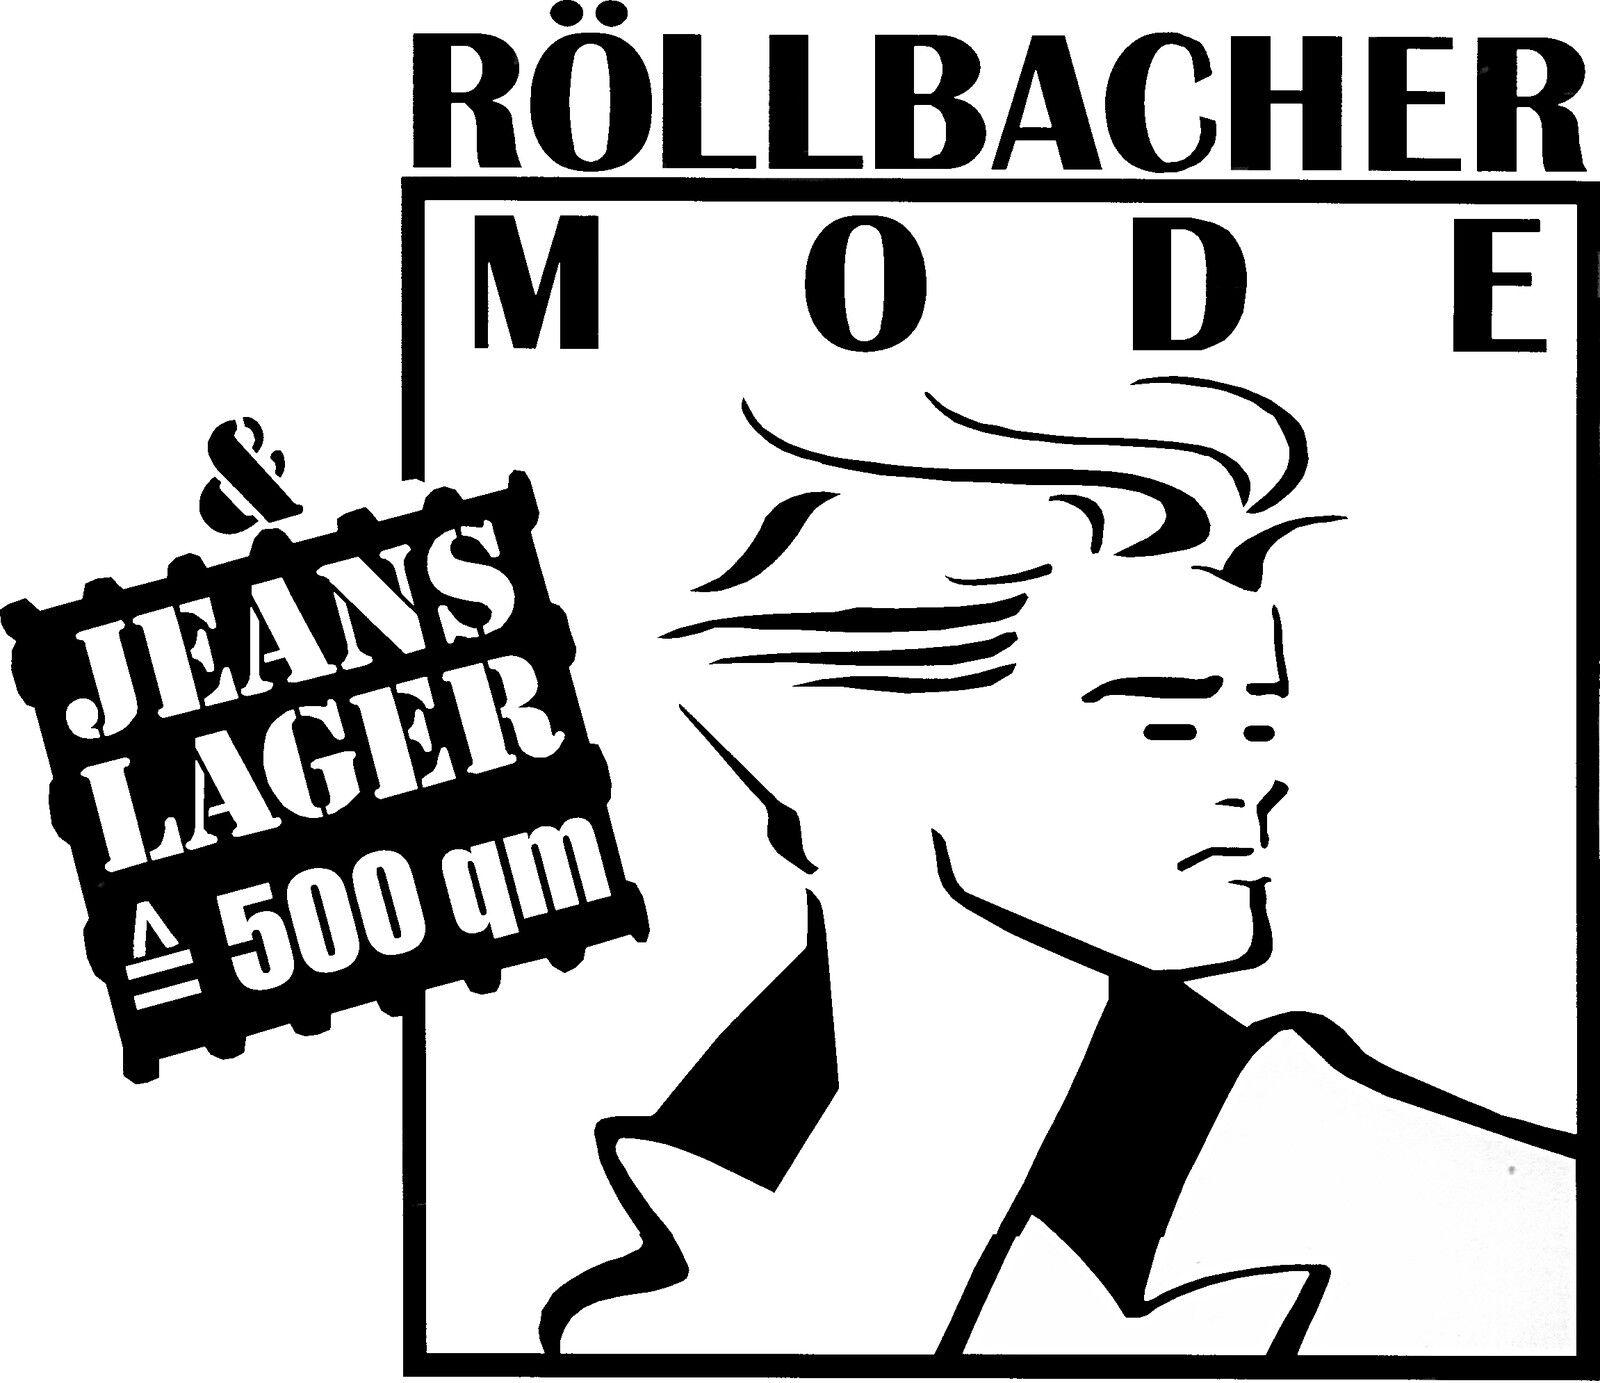 roellbacher-mode.jeans gbr